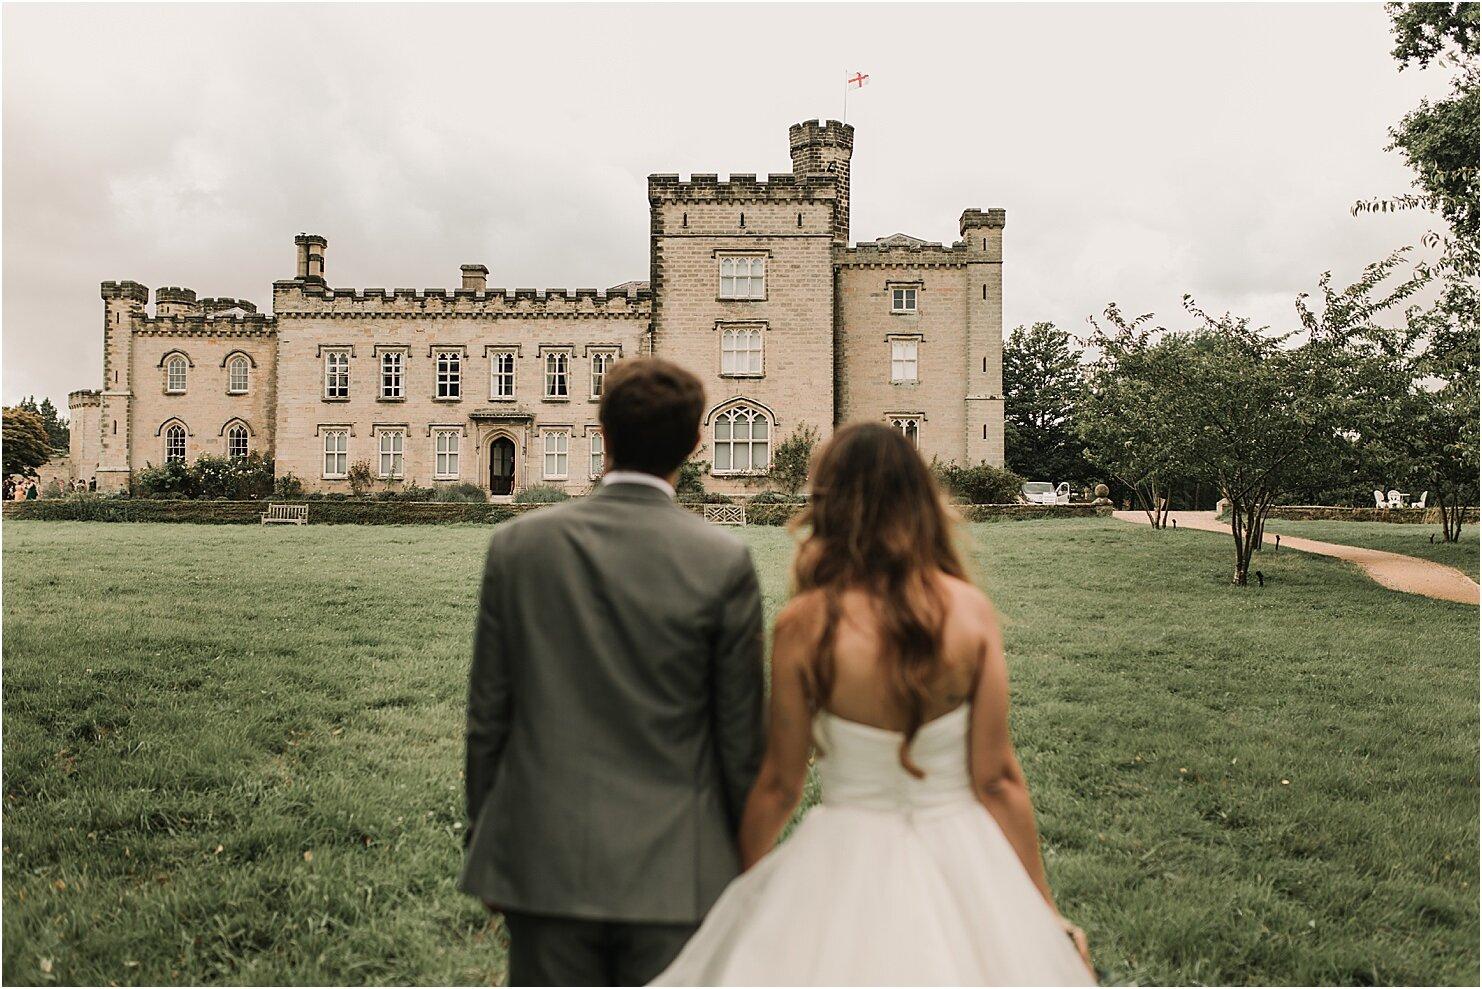 boda-de-cuento-en-castillo-boda-en-londres-68.jpg